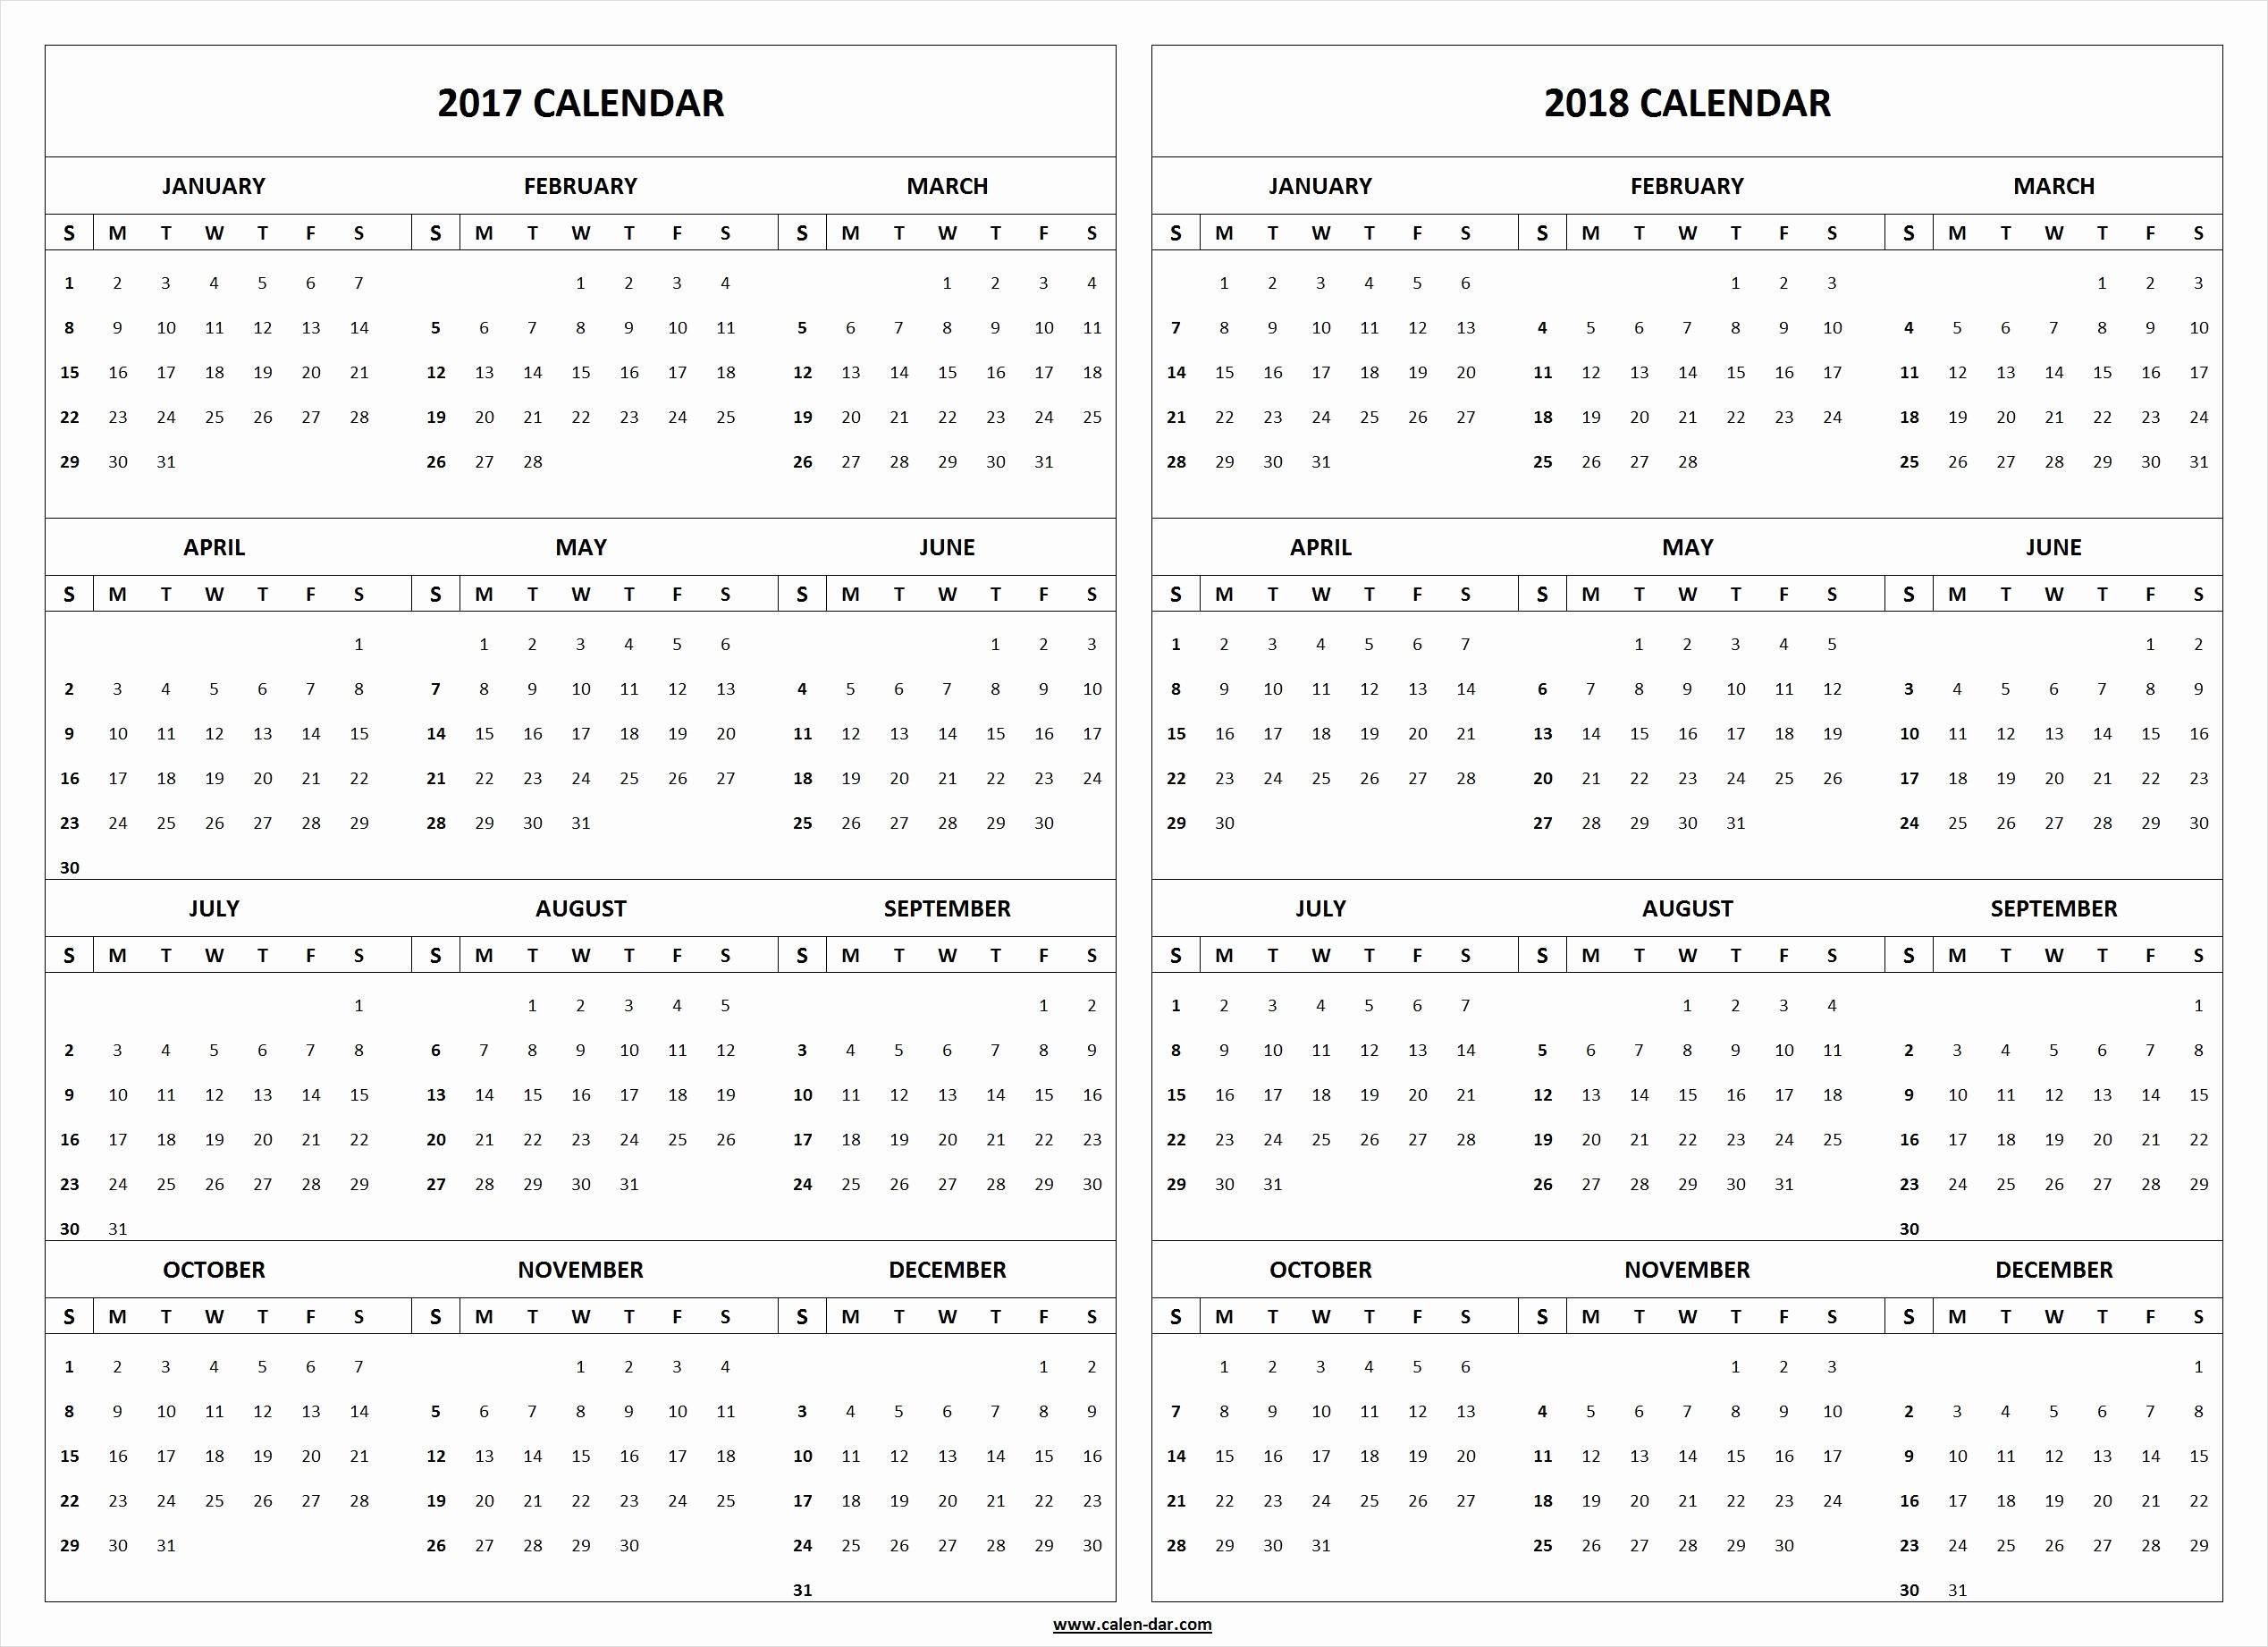 2017-2018 Blank Calendar New 2017 2018 Calendar Printable Template